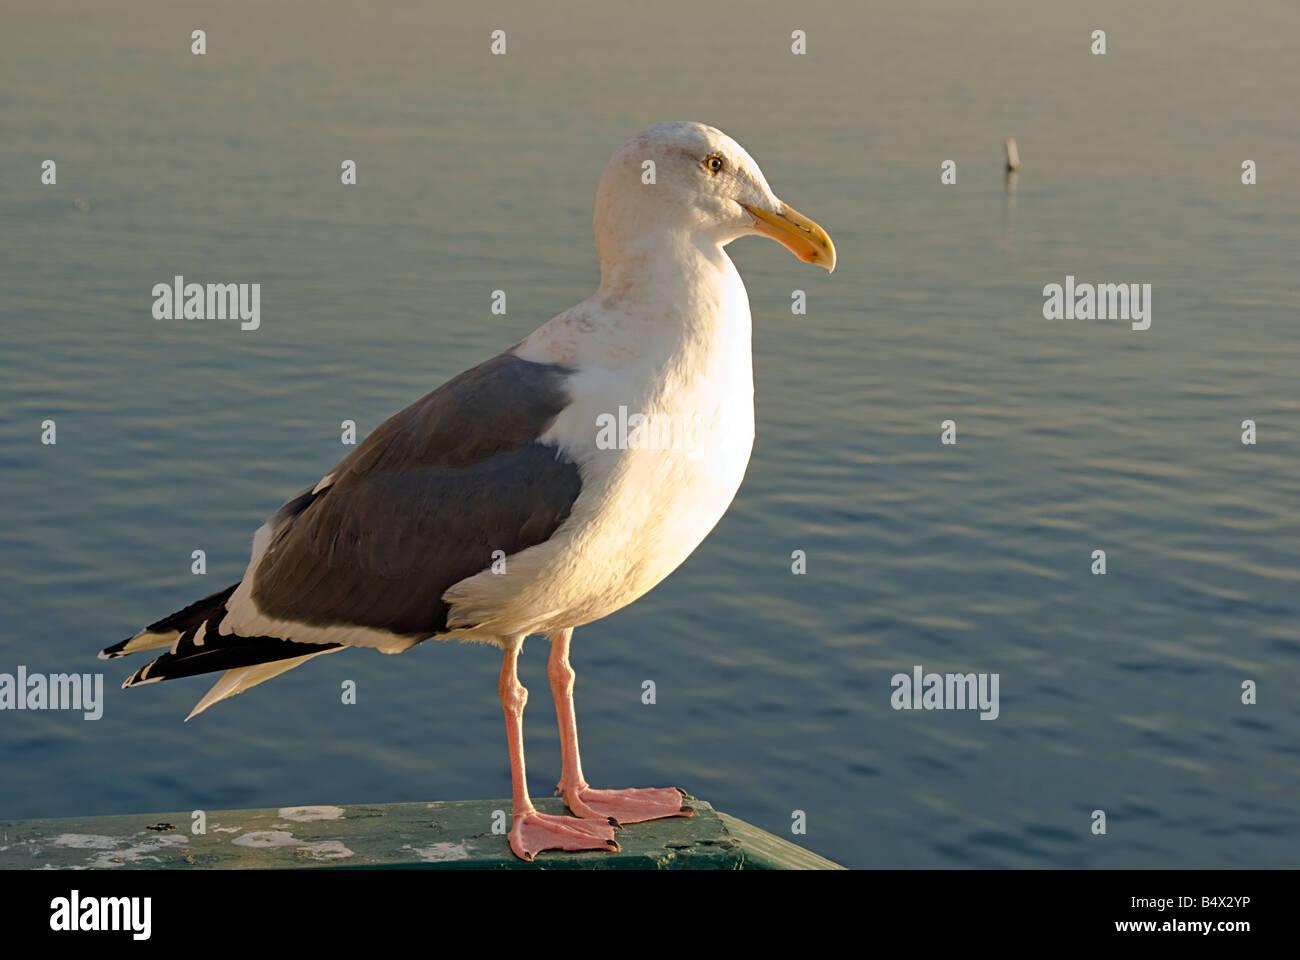 Sea Gull masculins de la baie de Santa Monica, CA Pacific Park Pier Photo Stock